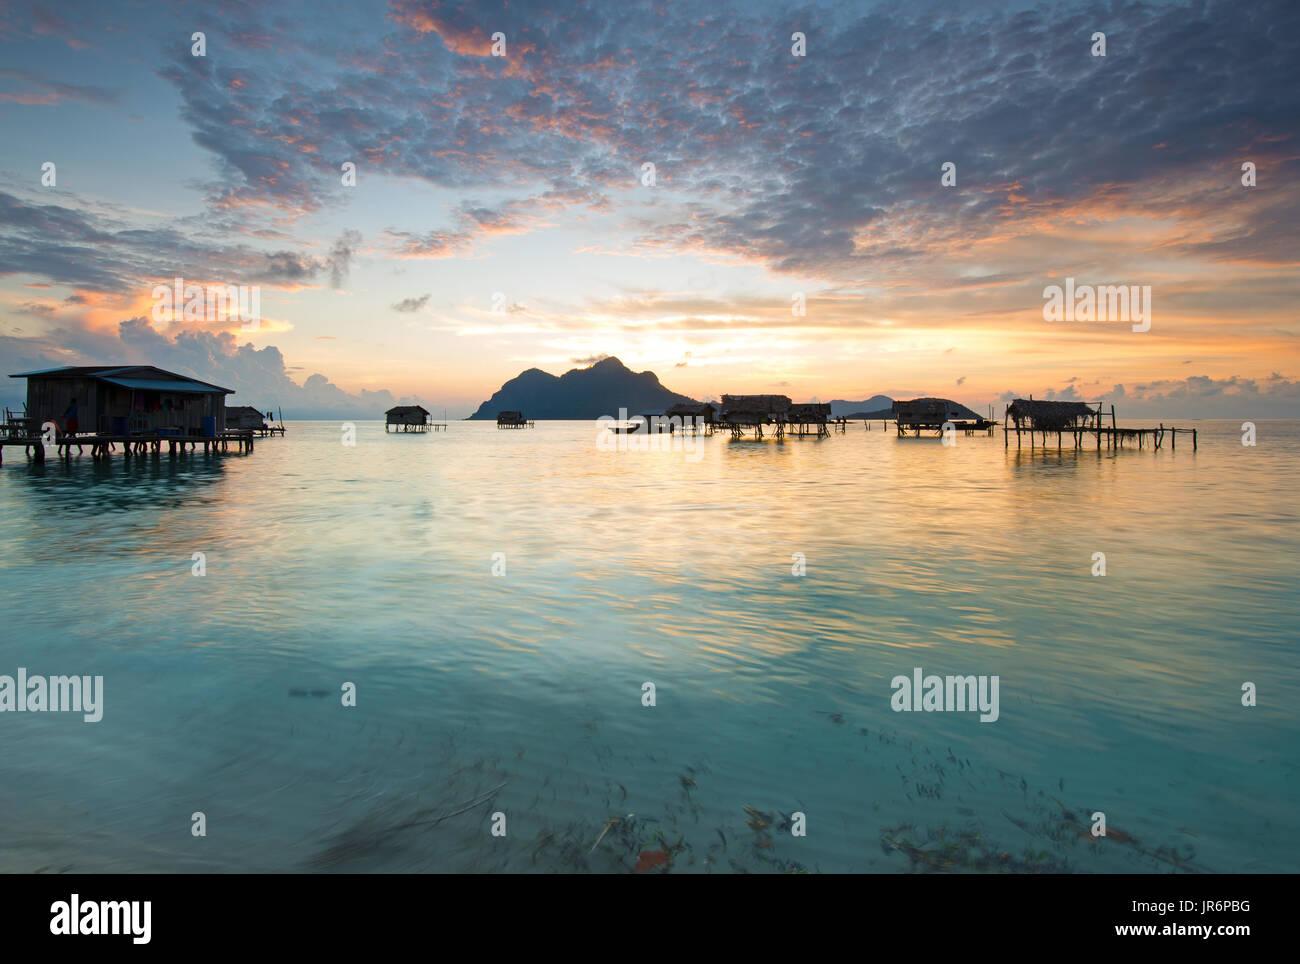 Beautiful sunrise in Tun Sakaran Marine Park, Semporna, Sabah Borneo, Malaysia. - Stock Image